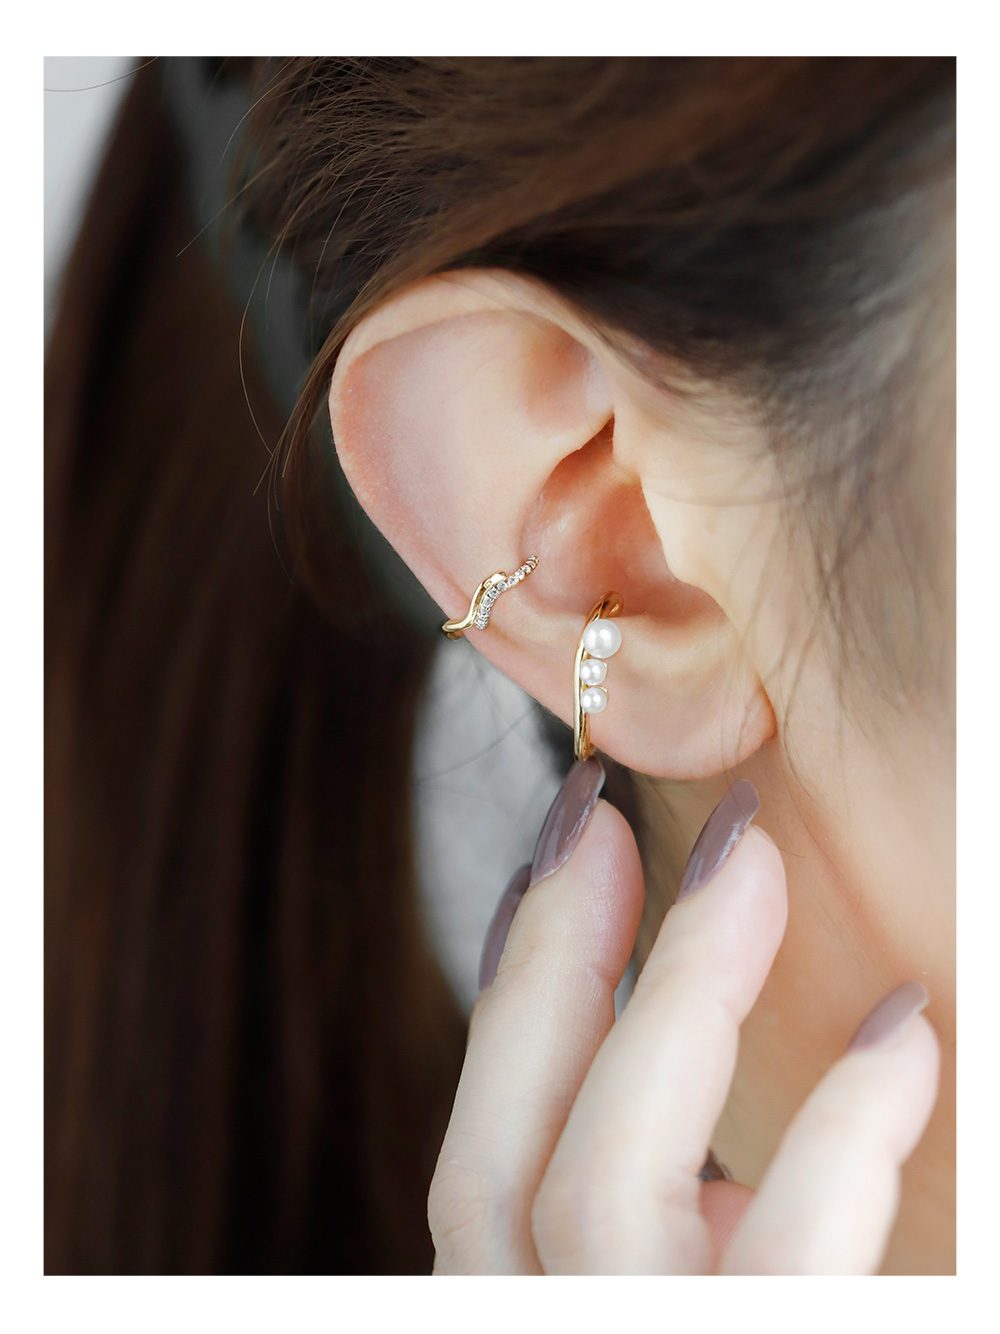 ANEMONEで叶える、大人かわいい旬な耳元コーデ